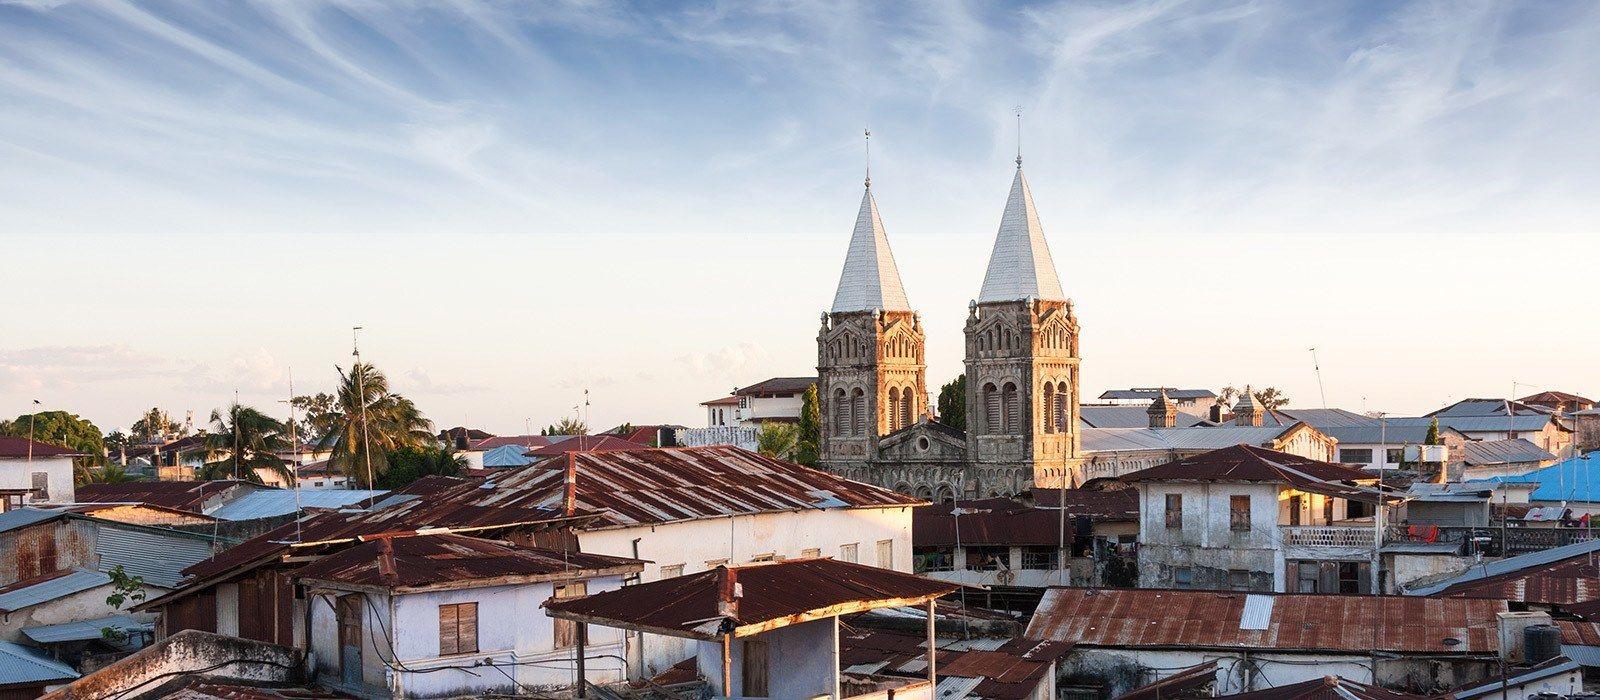 Destination Zanzibar Stone Town Tanzania